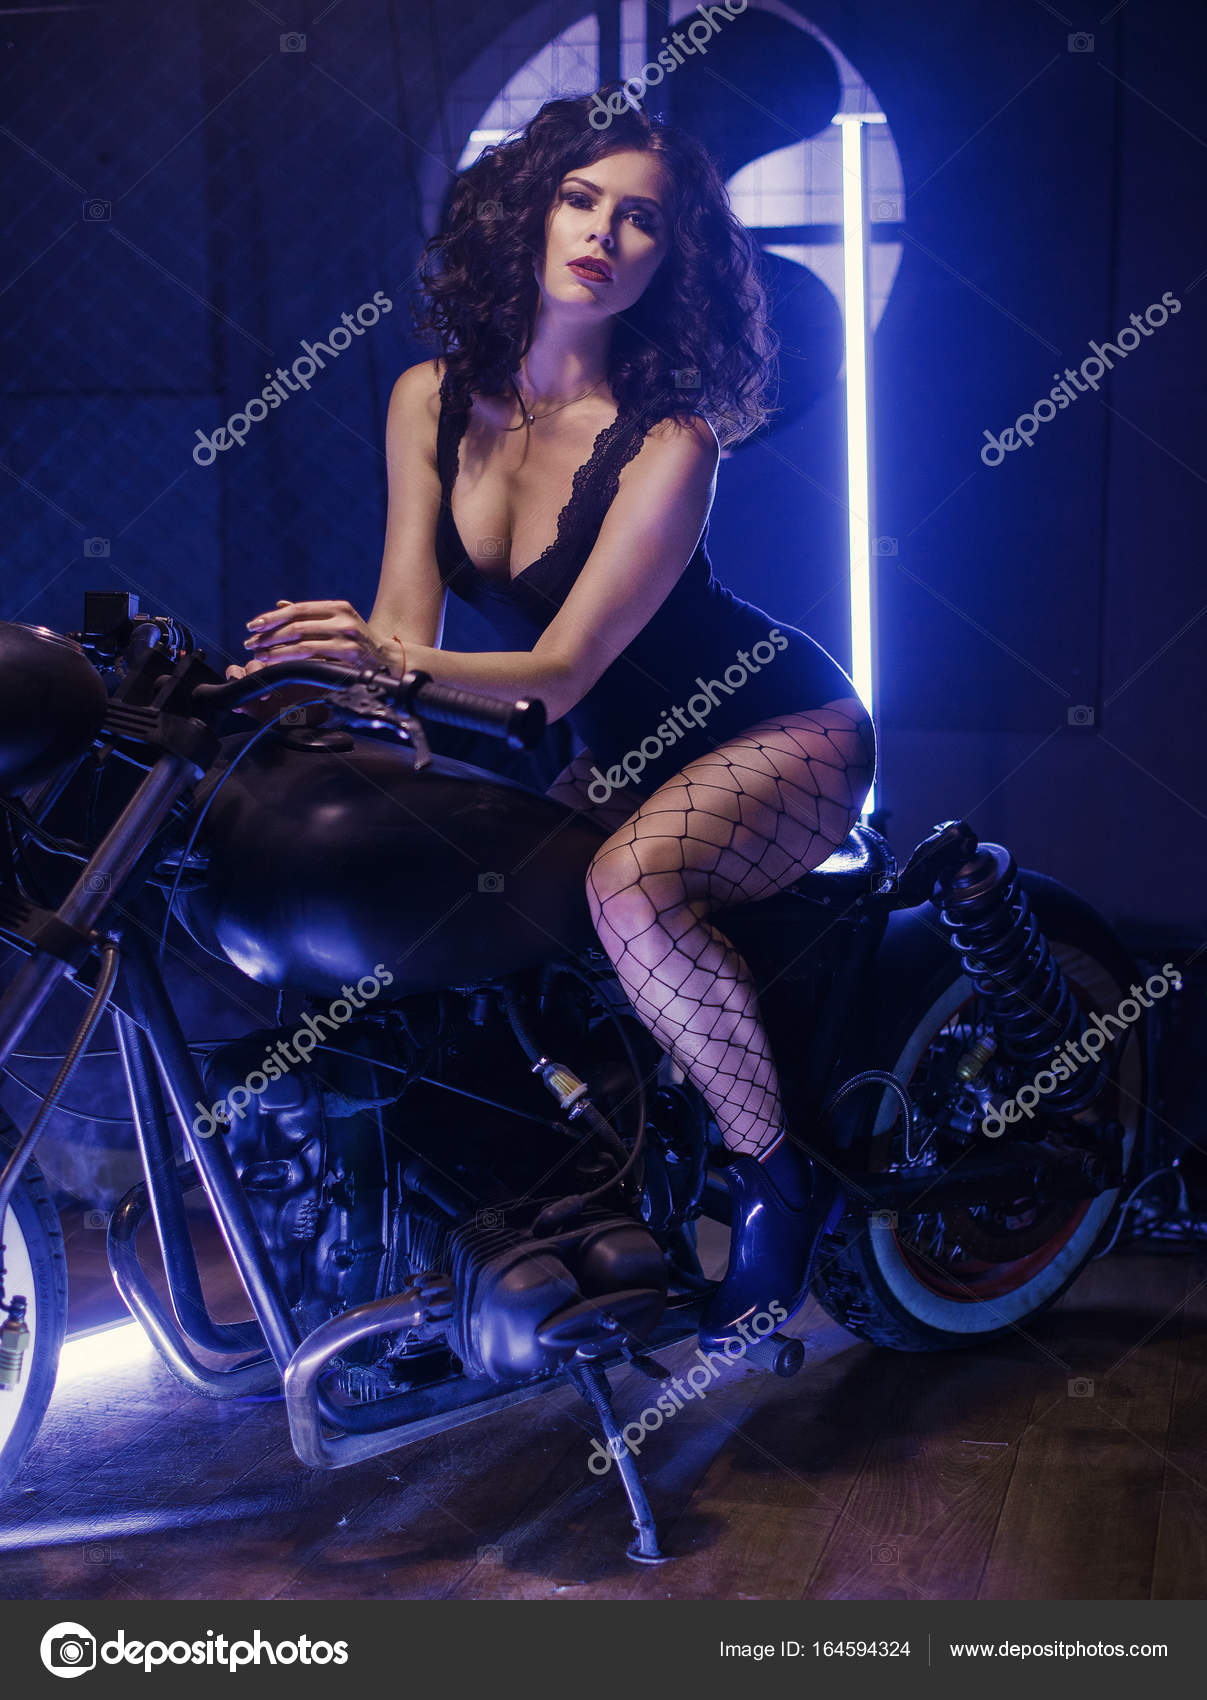 Motorcycle babe images 366 Biker Babe Stock Photos Free Royalty Free Biker Babe Images Depositphotos